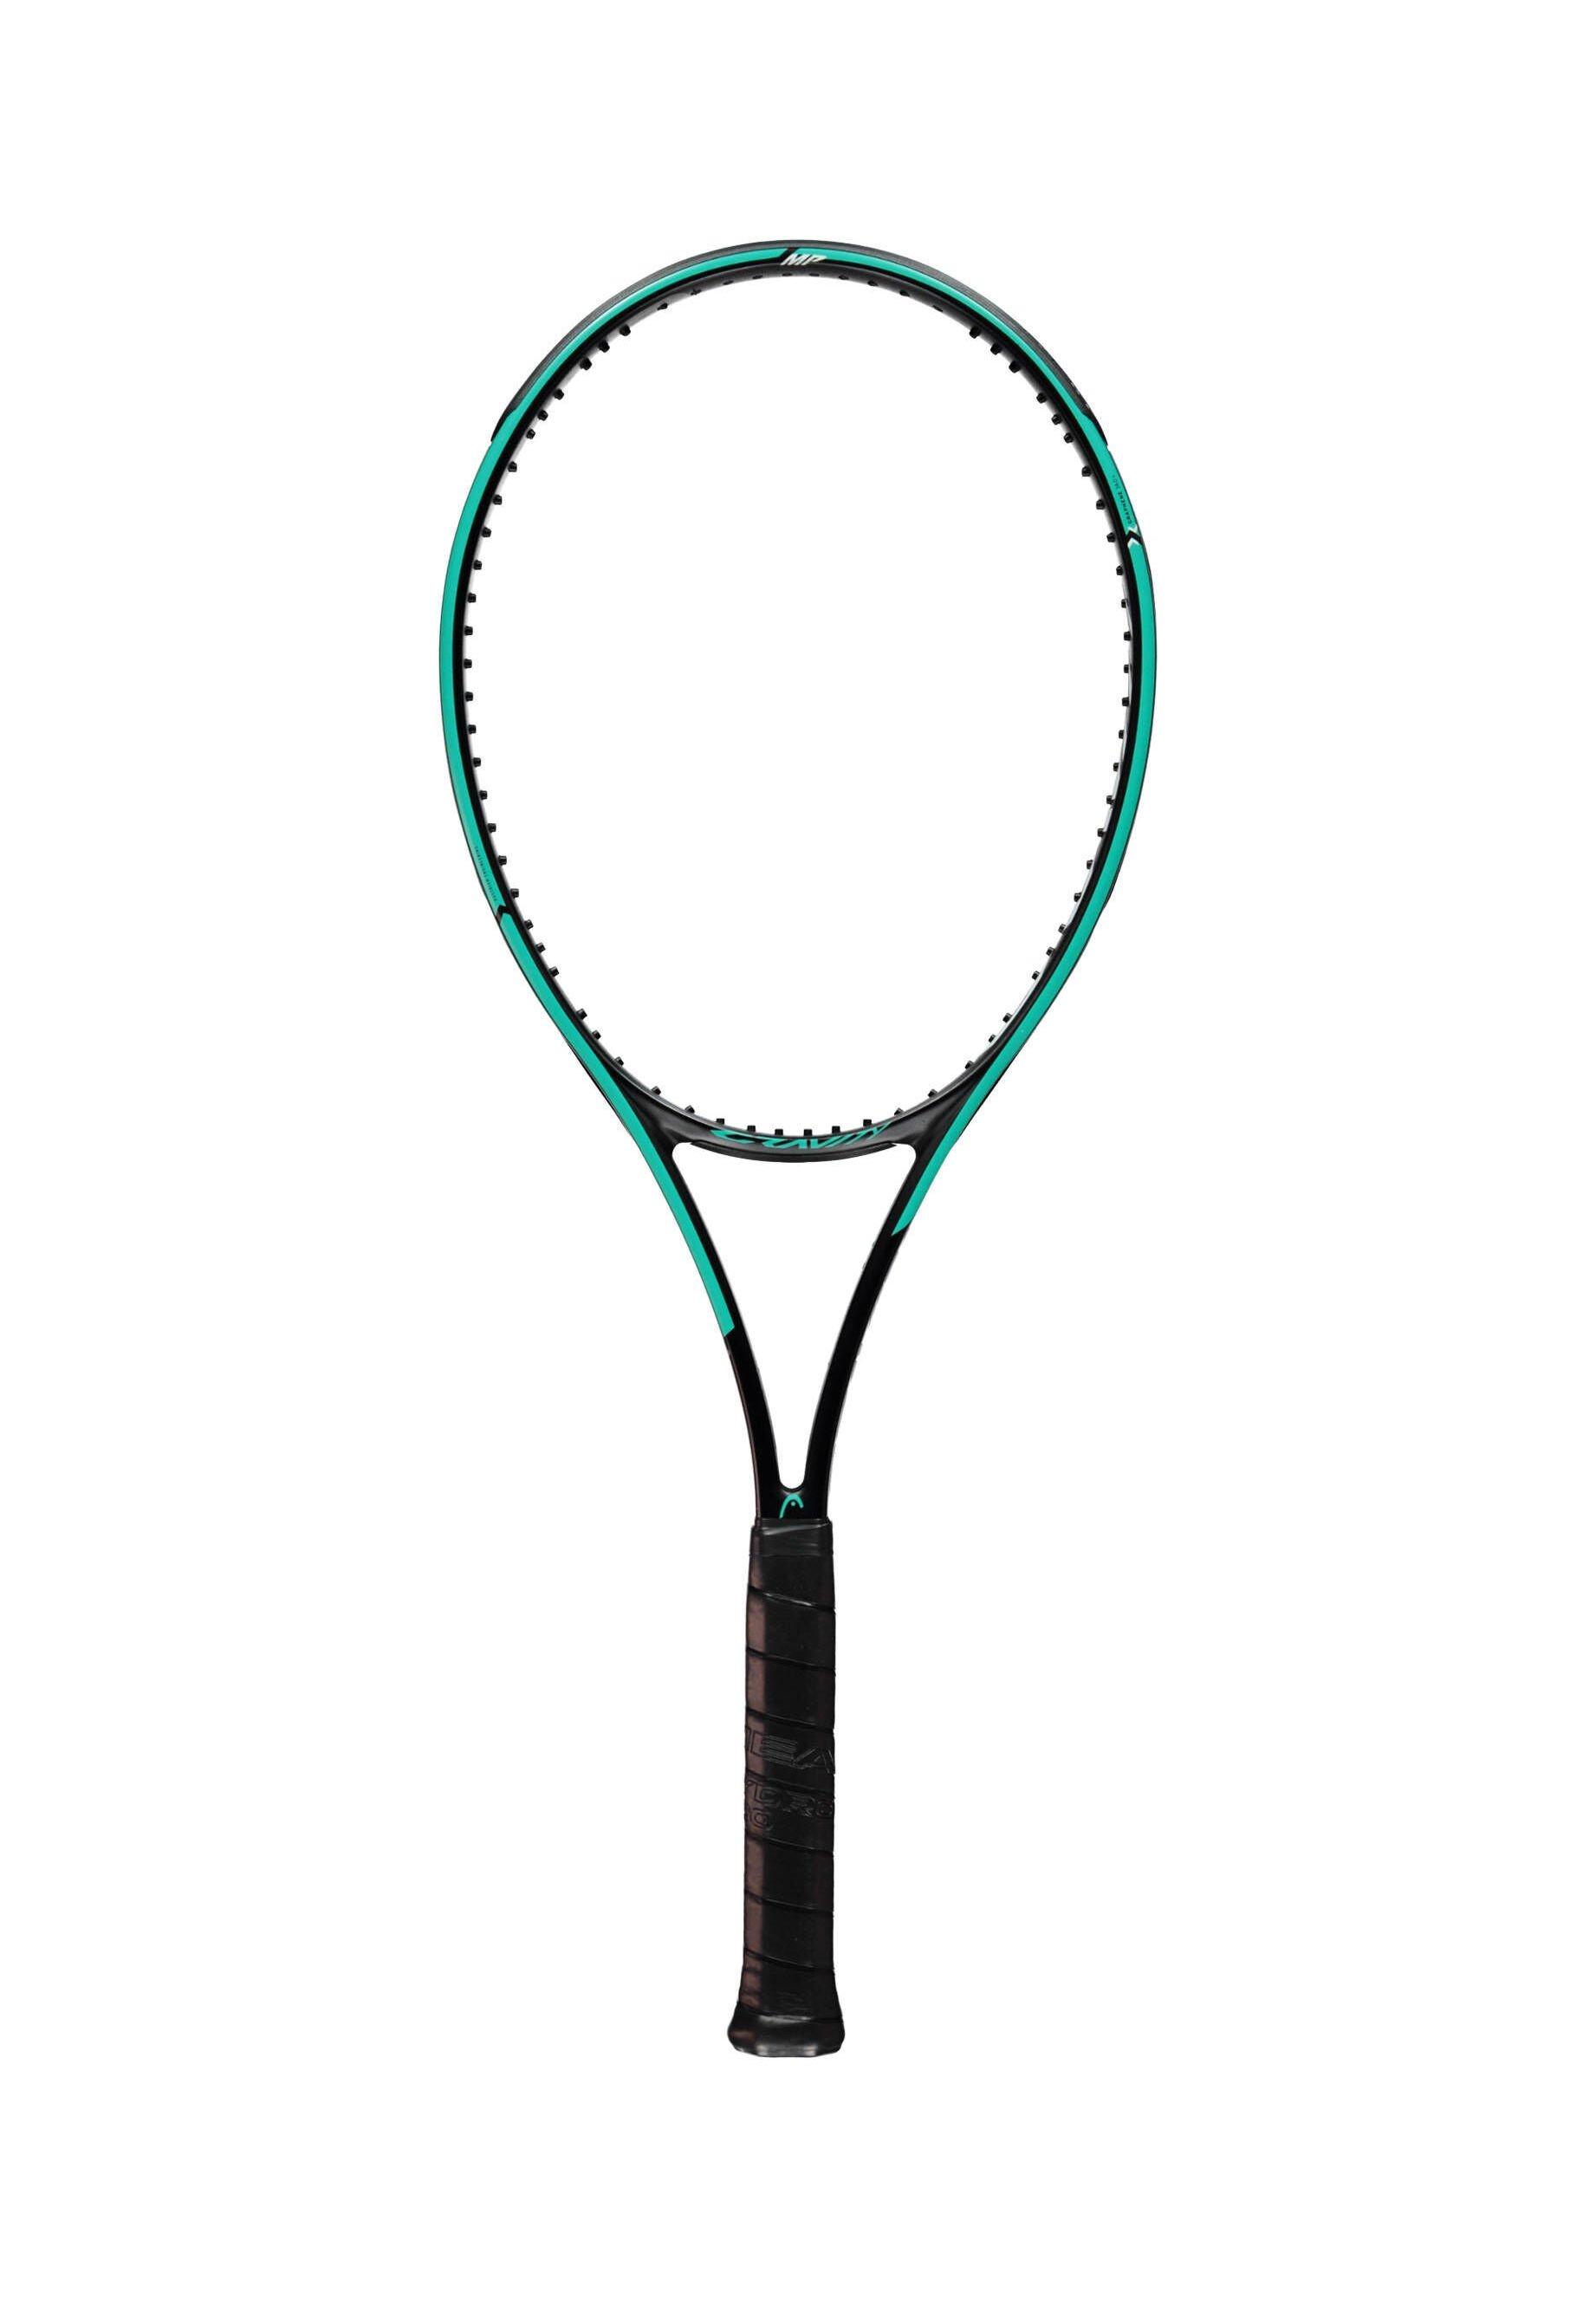 Herren Tennisschläger - türkis